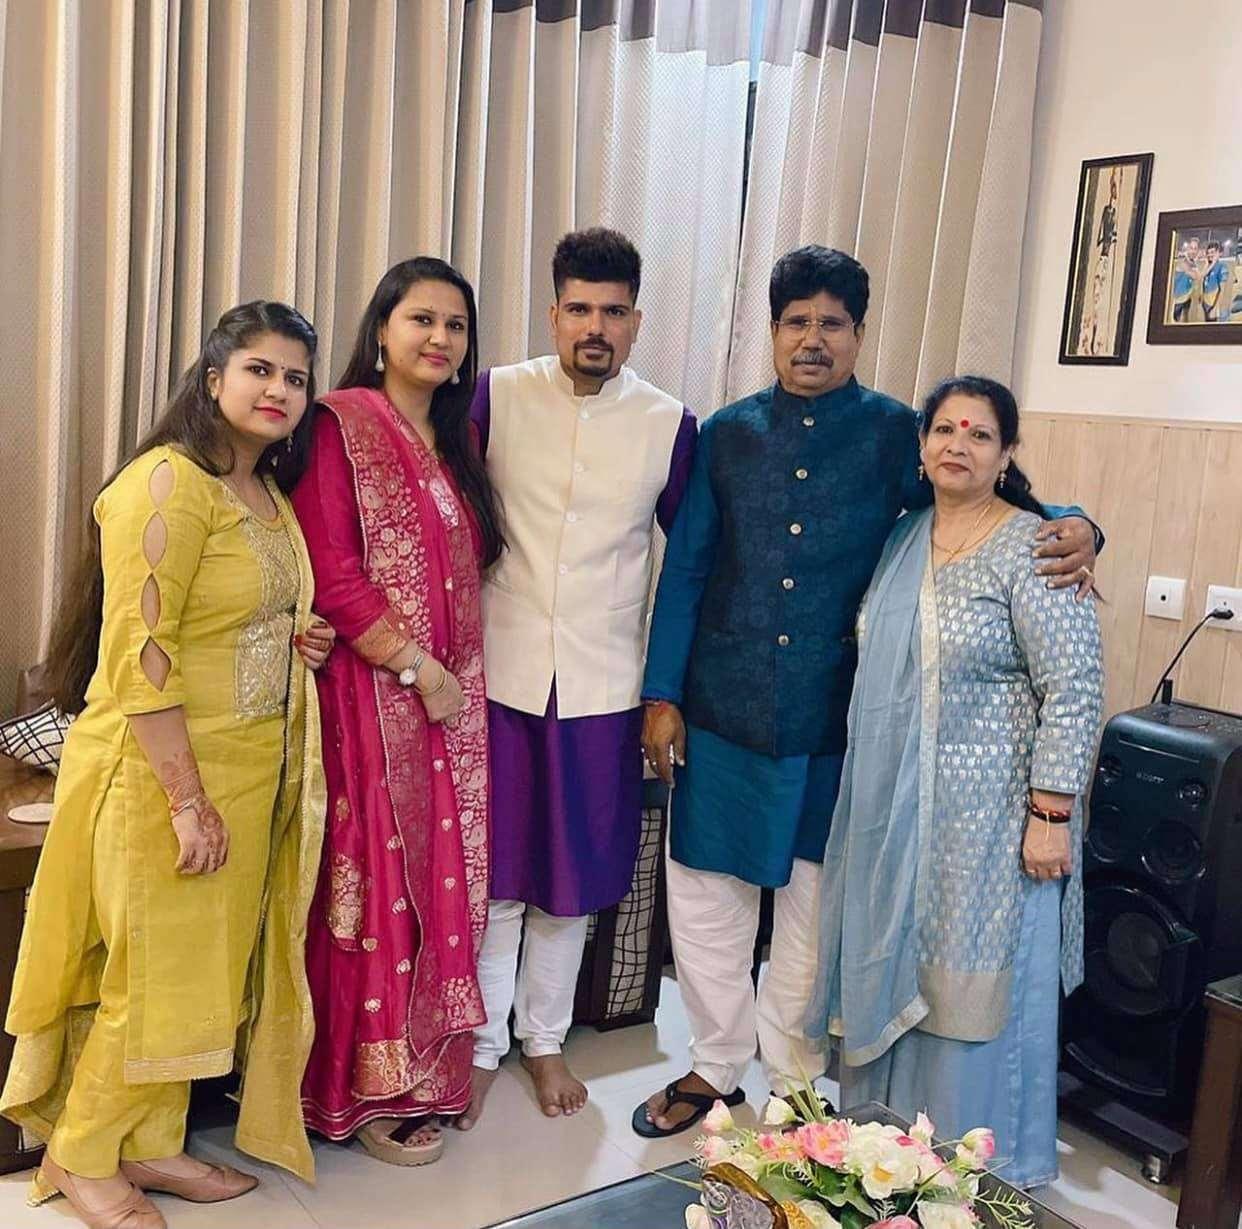 Karn Sharma with his family